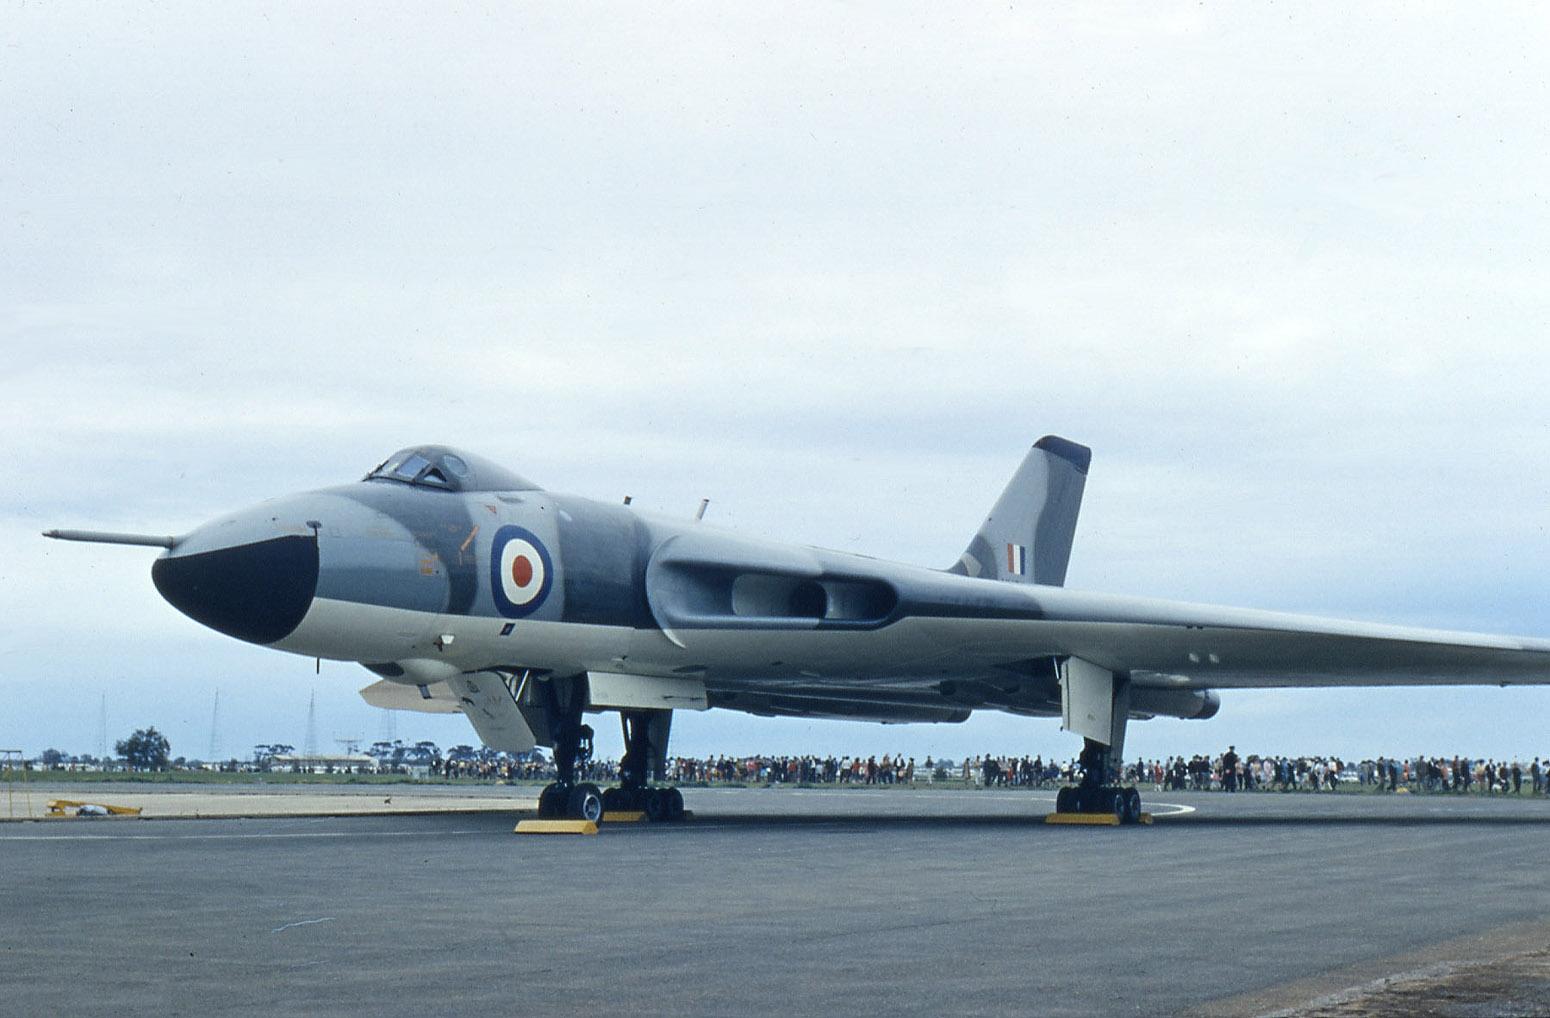 File:Avro_698_Vulcan_B2,_UK_ _Air_Force_AN0459164 on Net Force